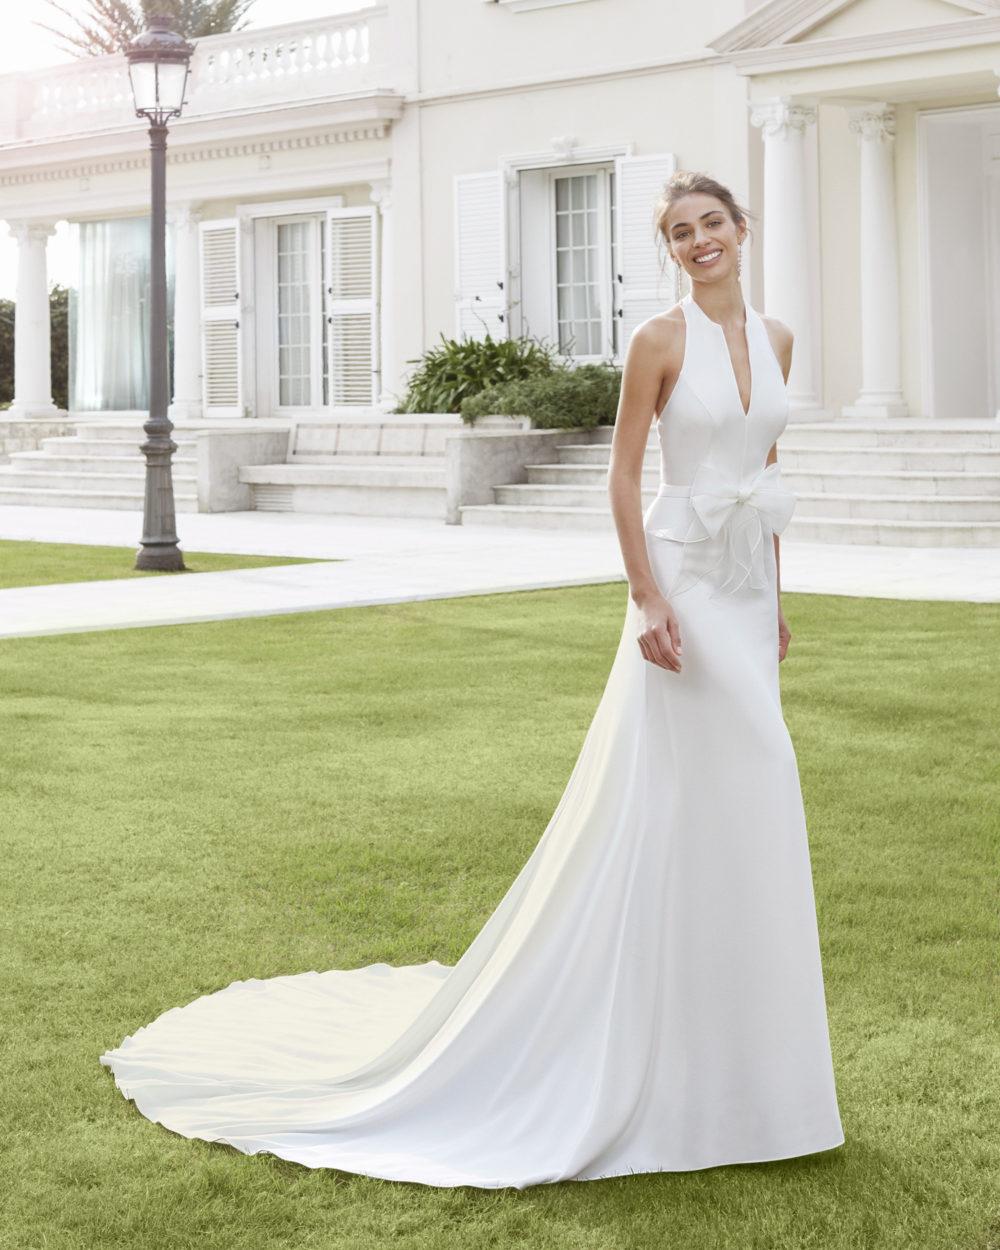 Mariages: abito da sposa Rosa Clarà 2020 a Vicenza, Verona, Padova, Veneto 4A129 CARIEL